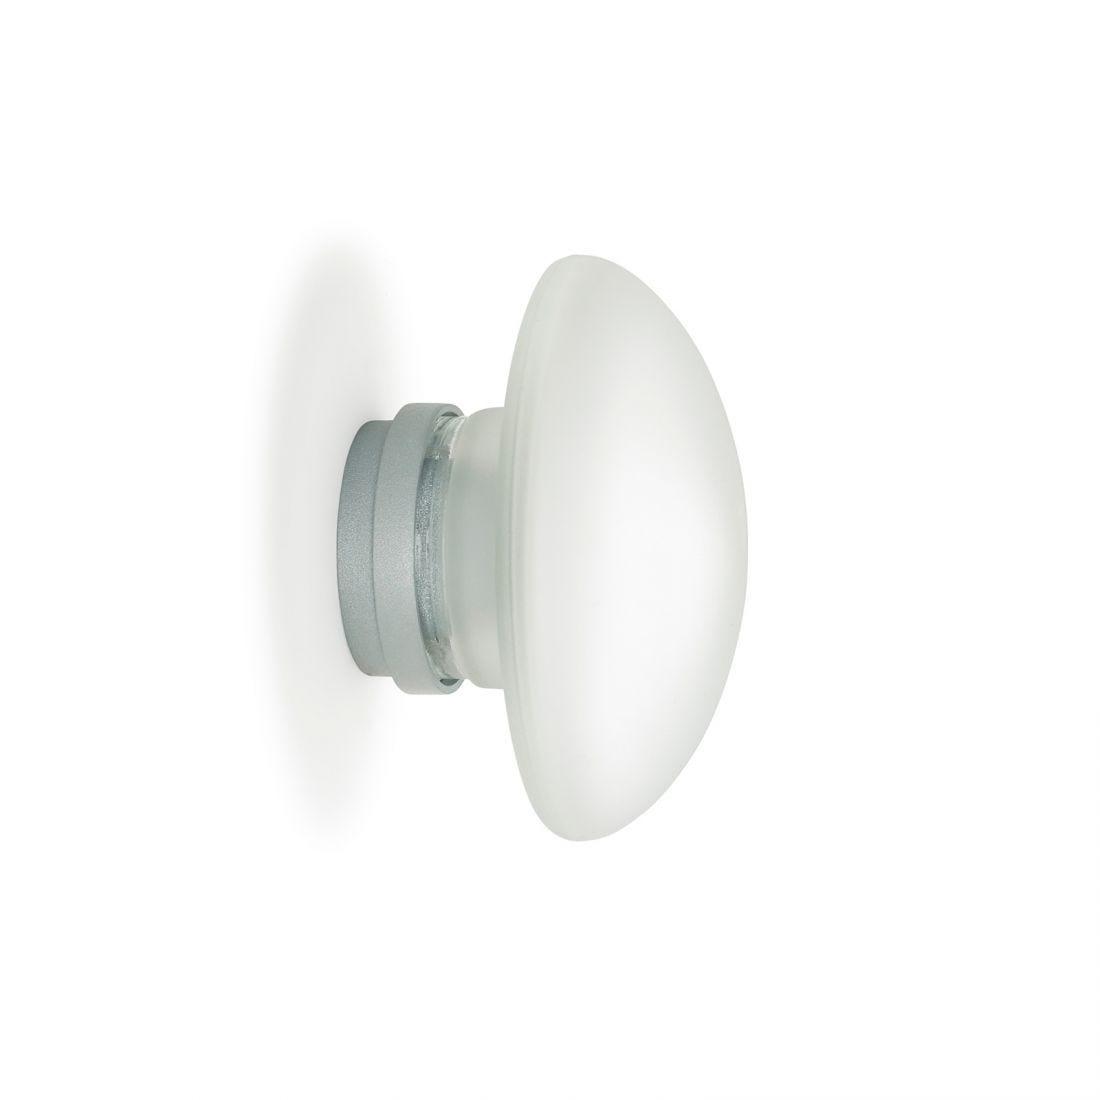 Fontana Arte Sillaba Large LED Wand-Plafondlamp